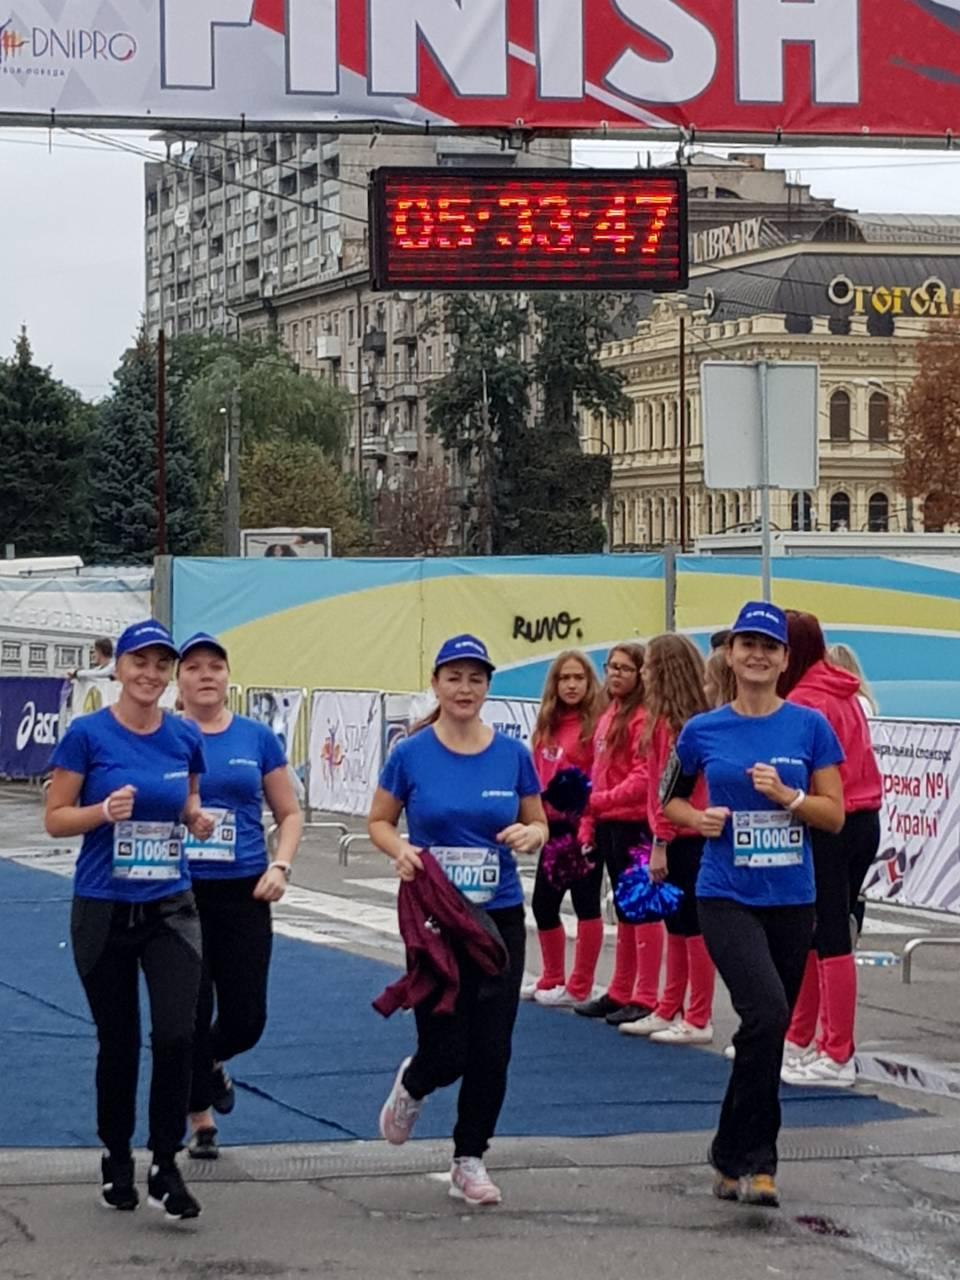 Сотрудники МТБ БАНКа пробежали благотворительную «Милю добра» - фото 3 - mtb.ua